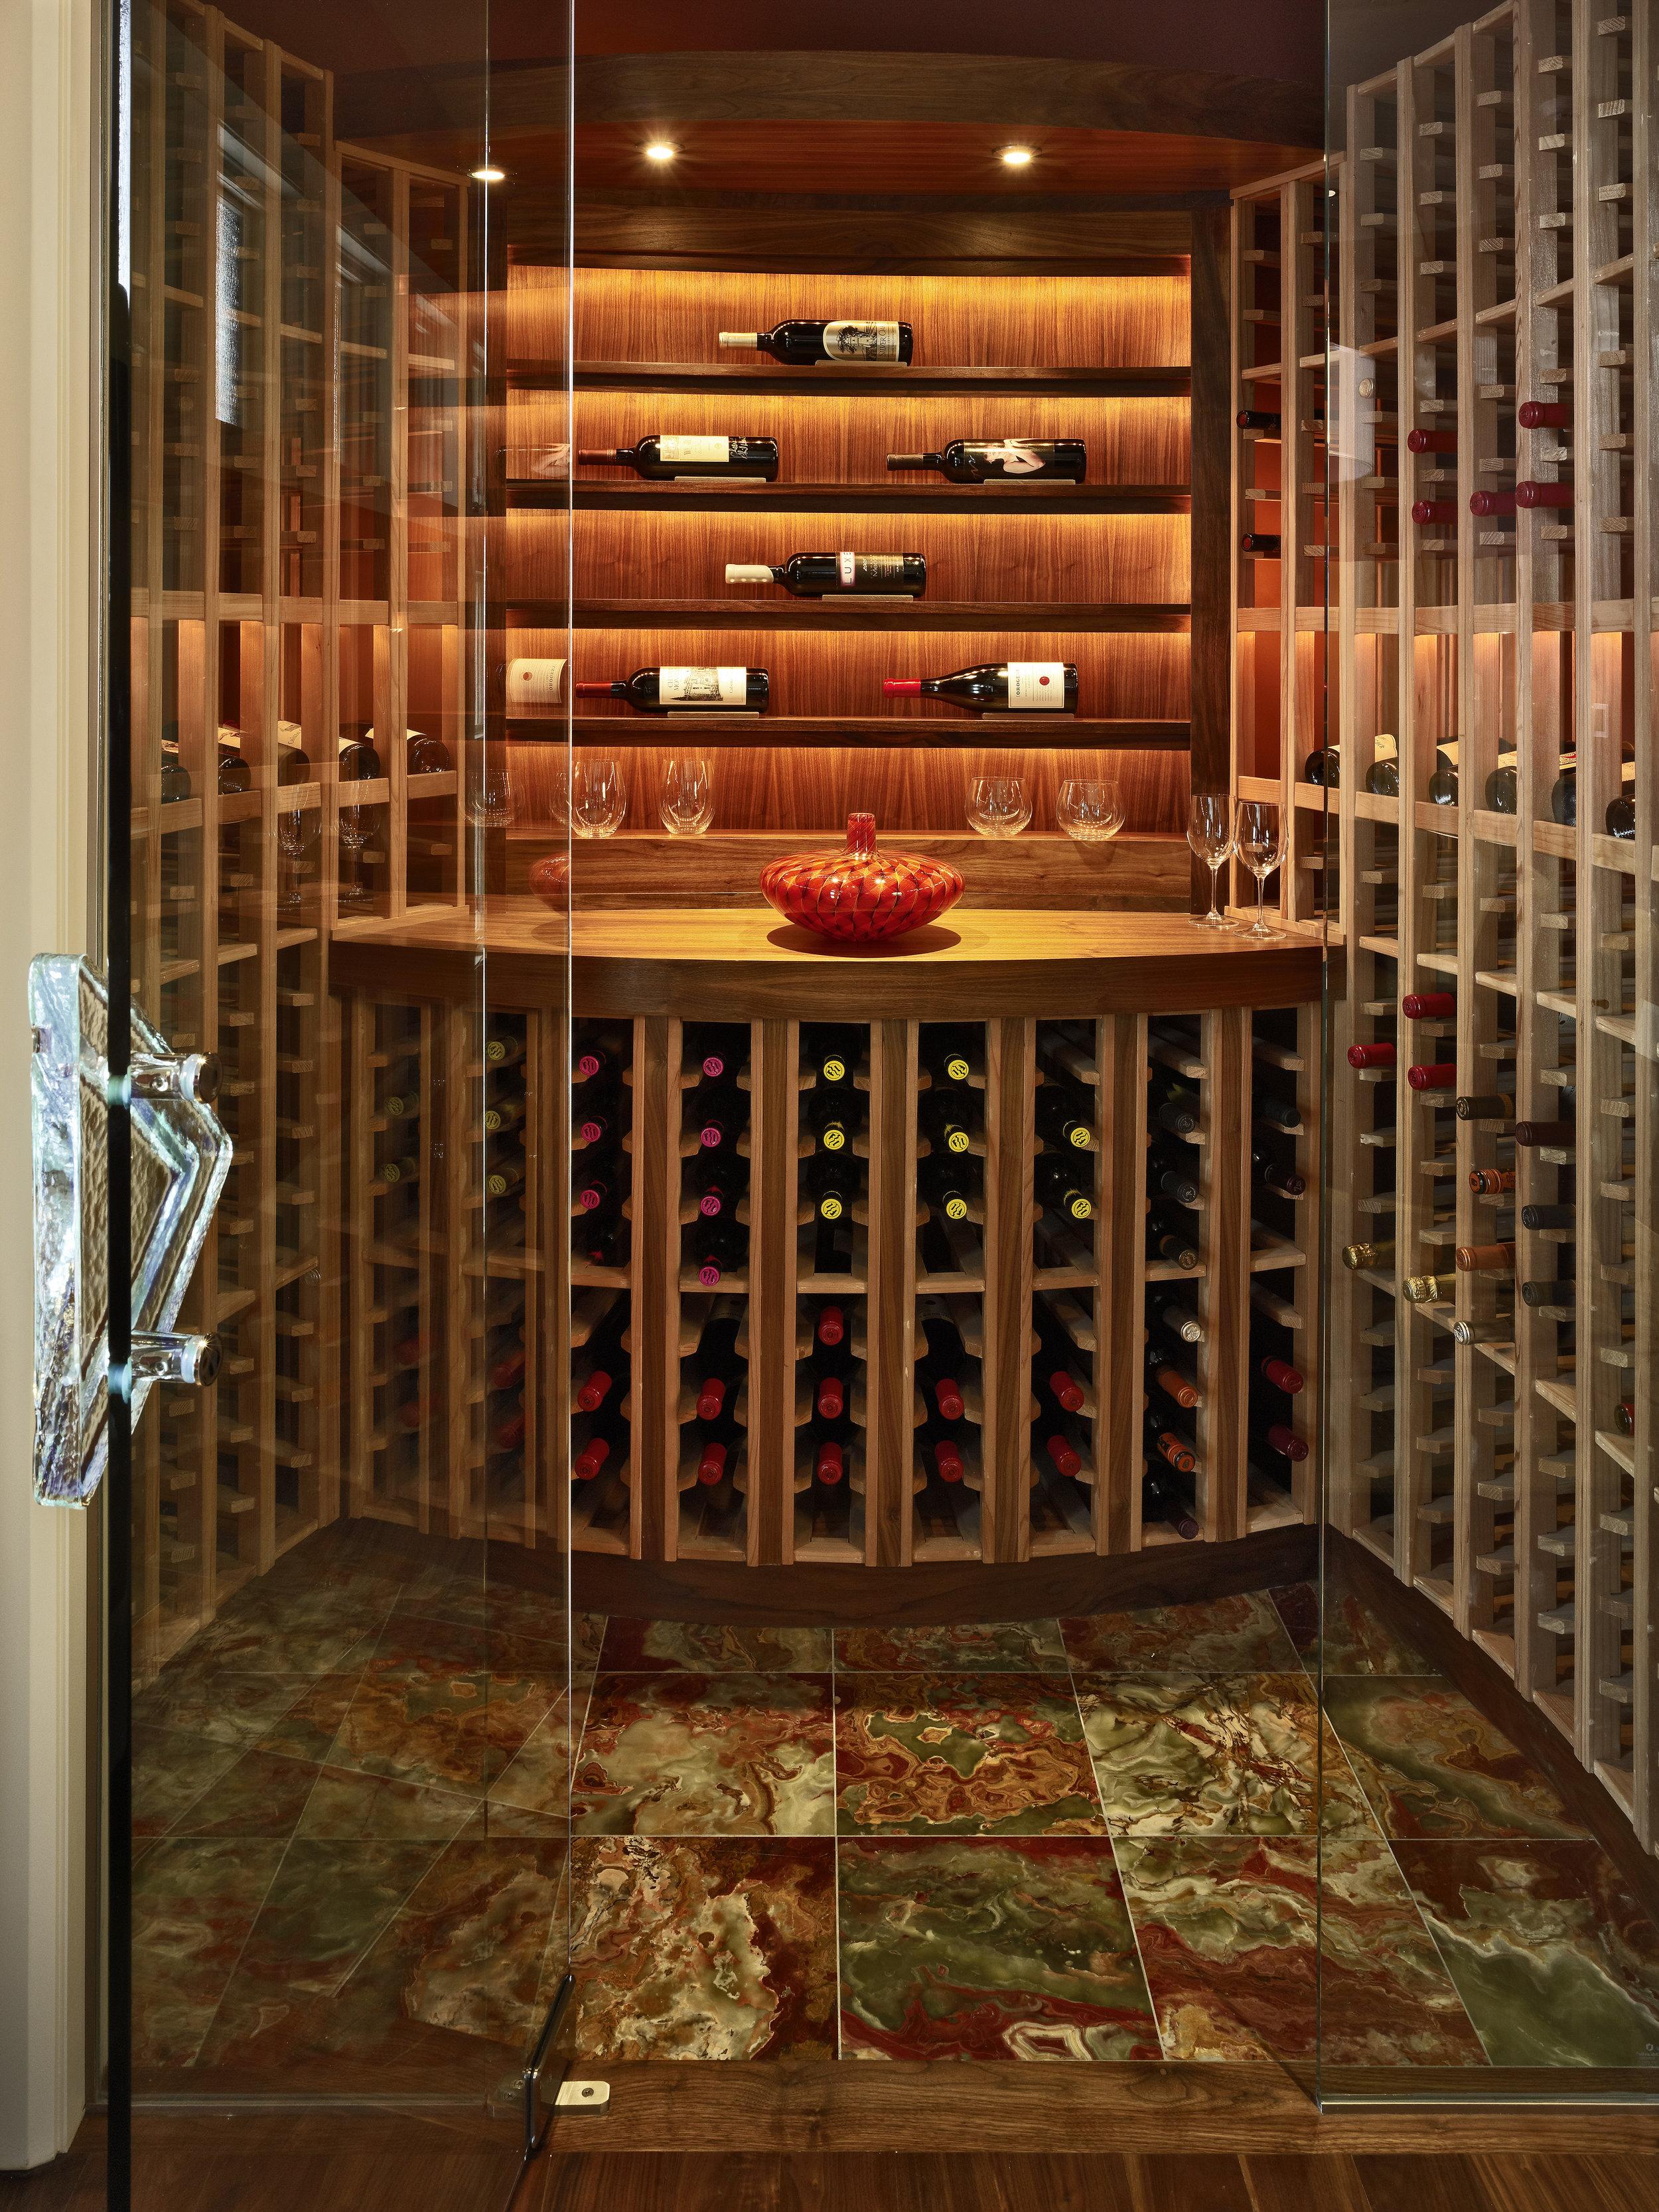 14-Castle-Pines-wine cellar.jpg